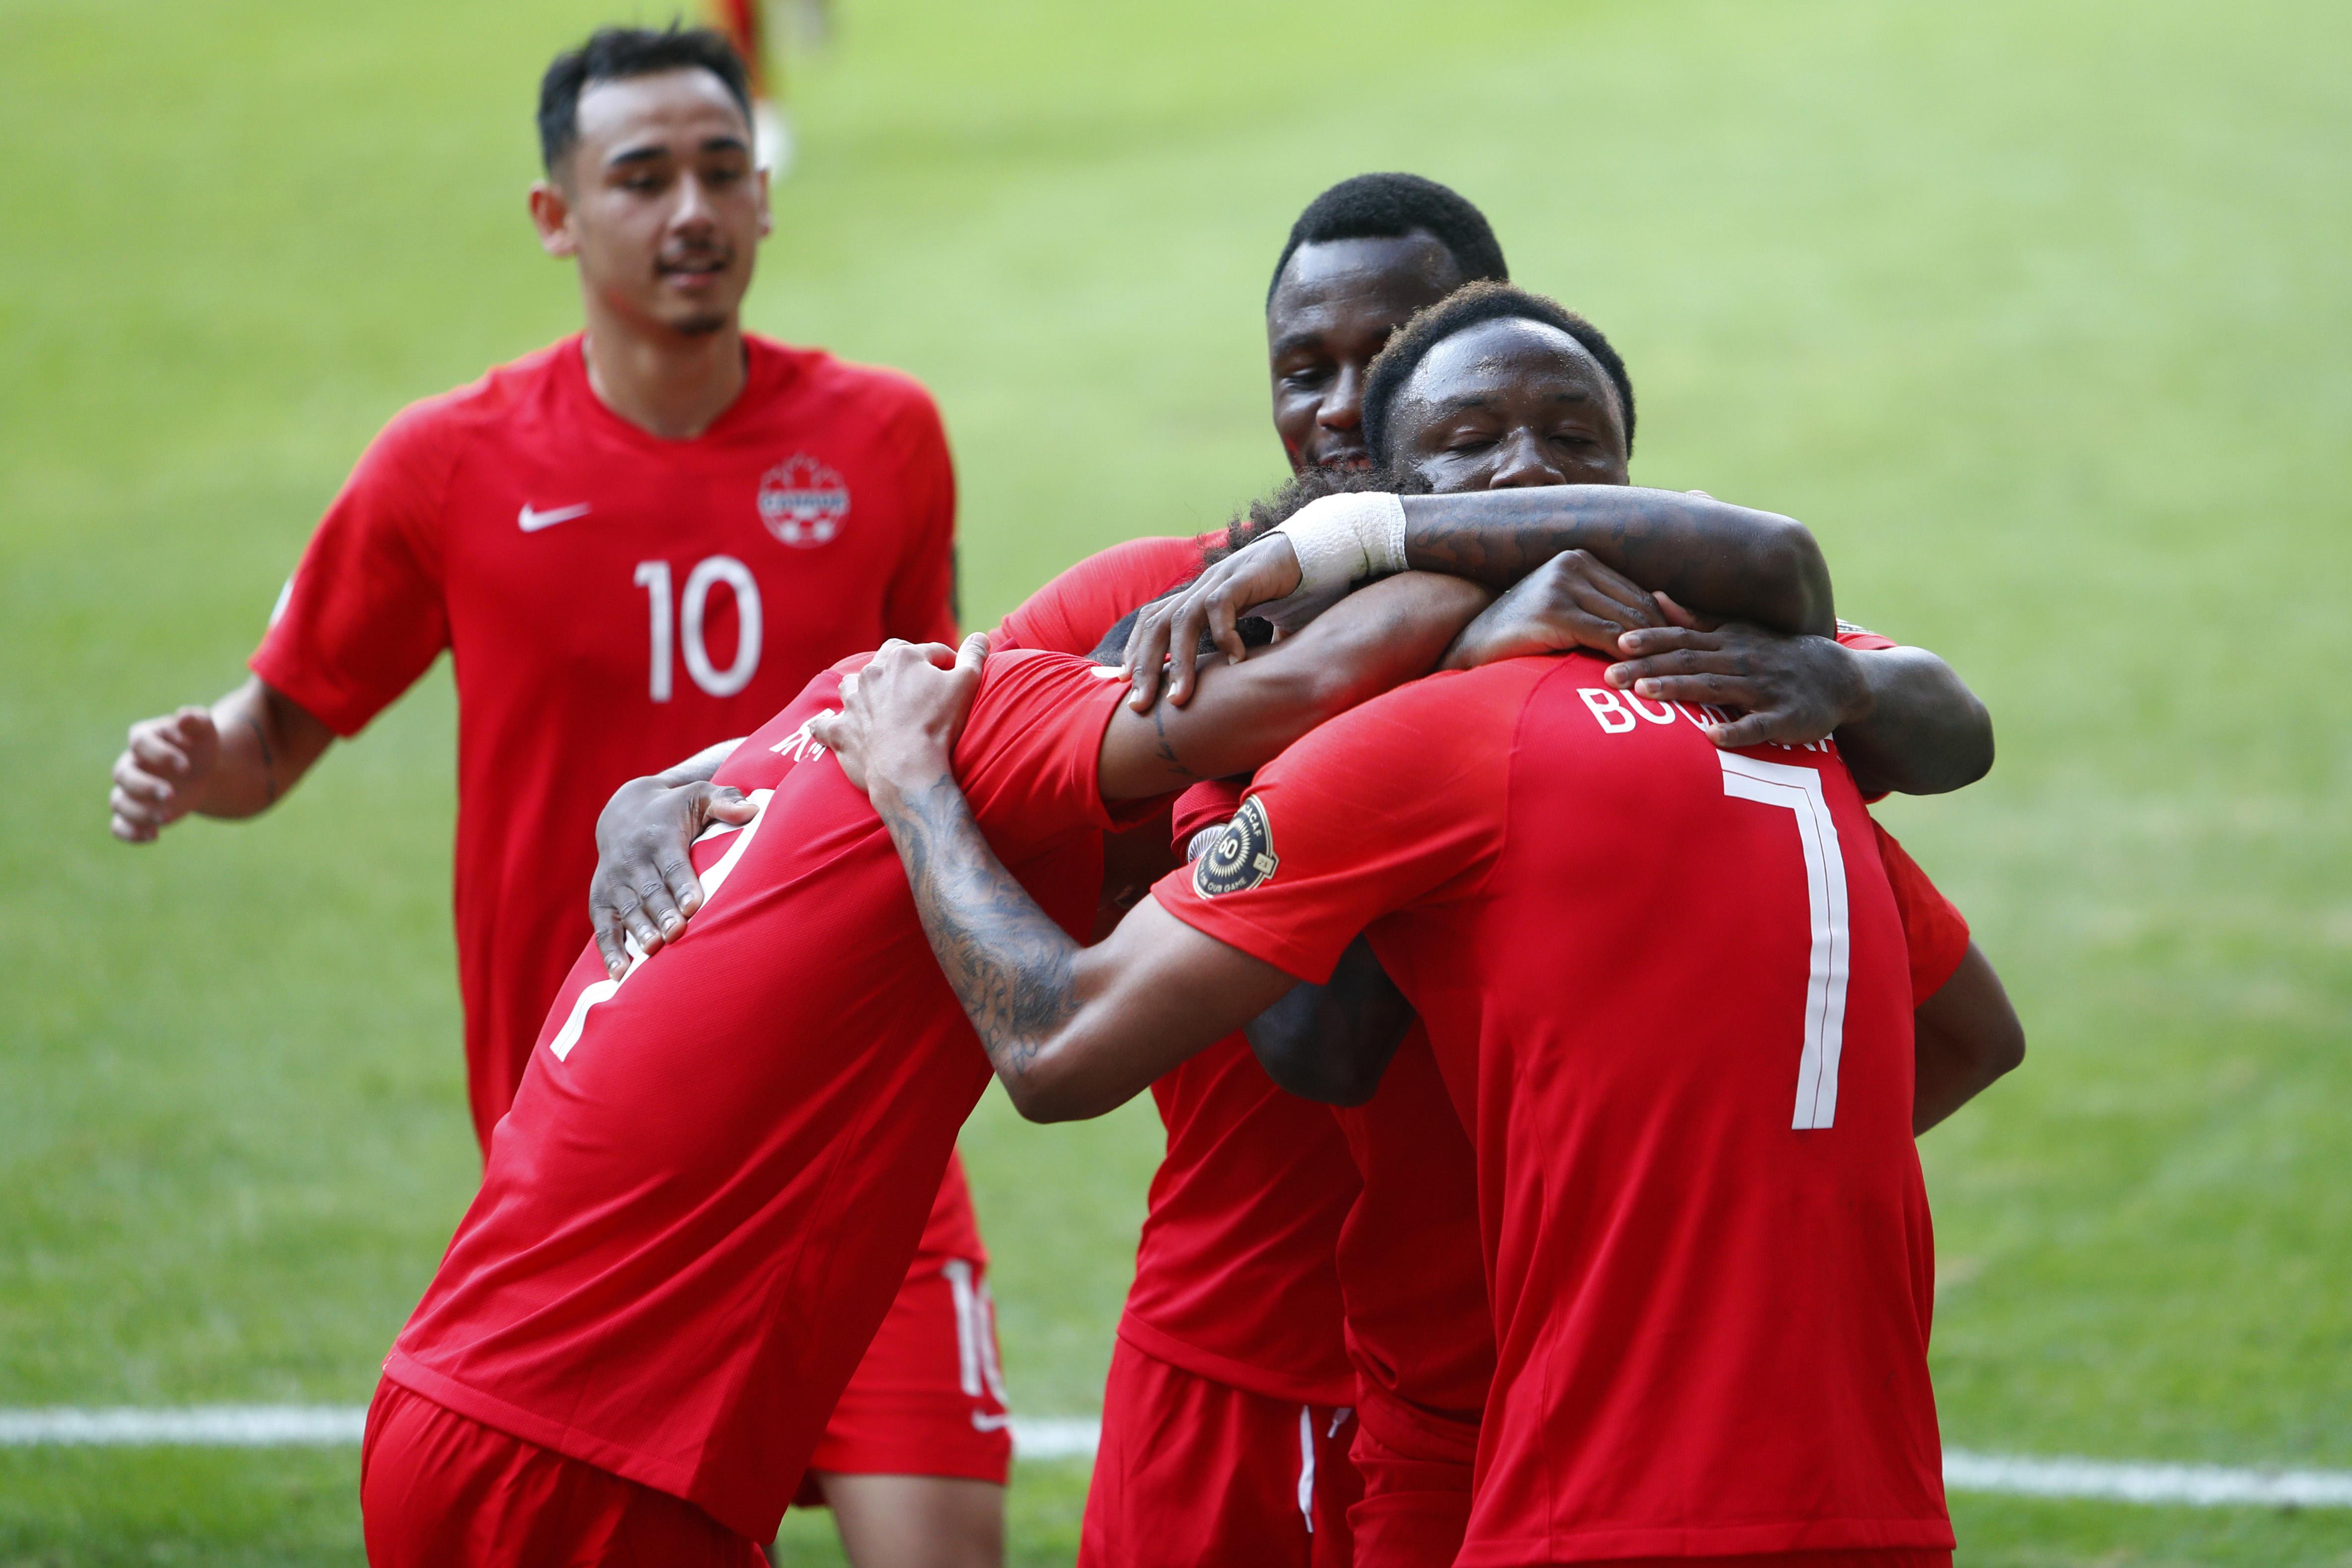 Canada v El Salvador - 2020 Concacaf Men's Olympic Qualifying